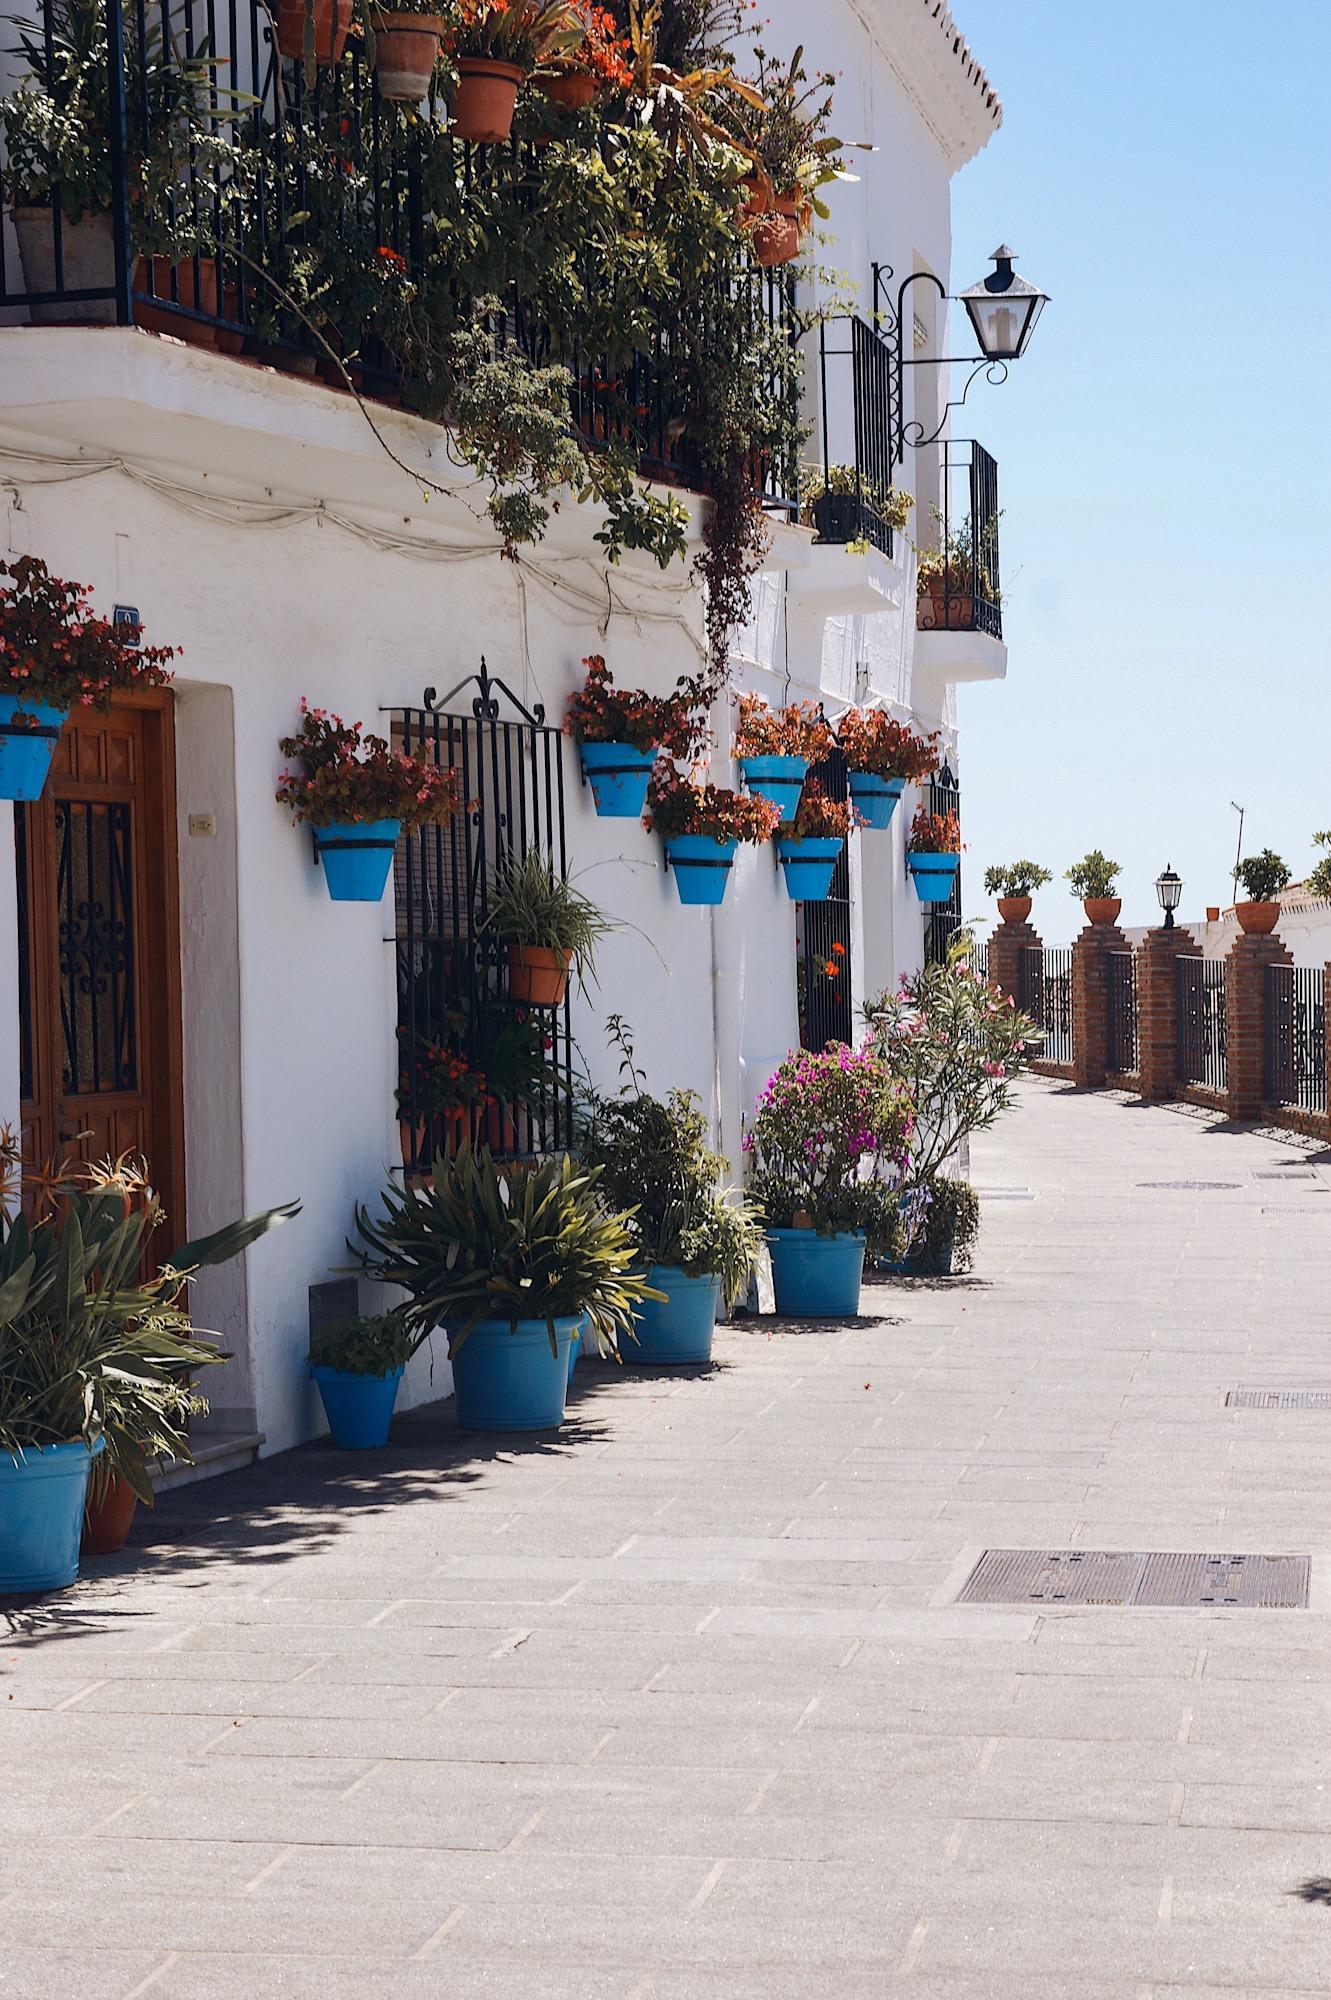 Mijas, Andalusien, Andalucia, pueblos blanco, weiße Dörfer Andalusien